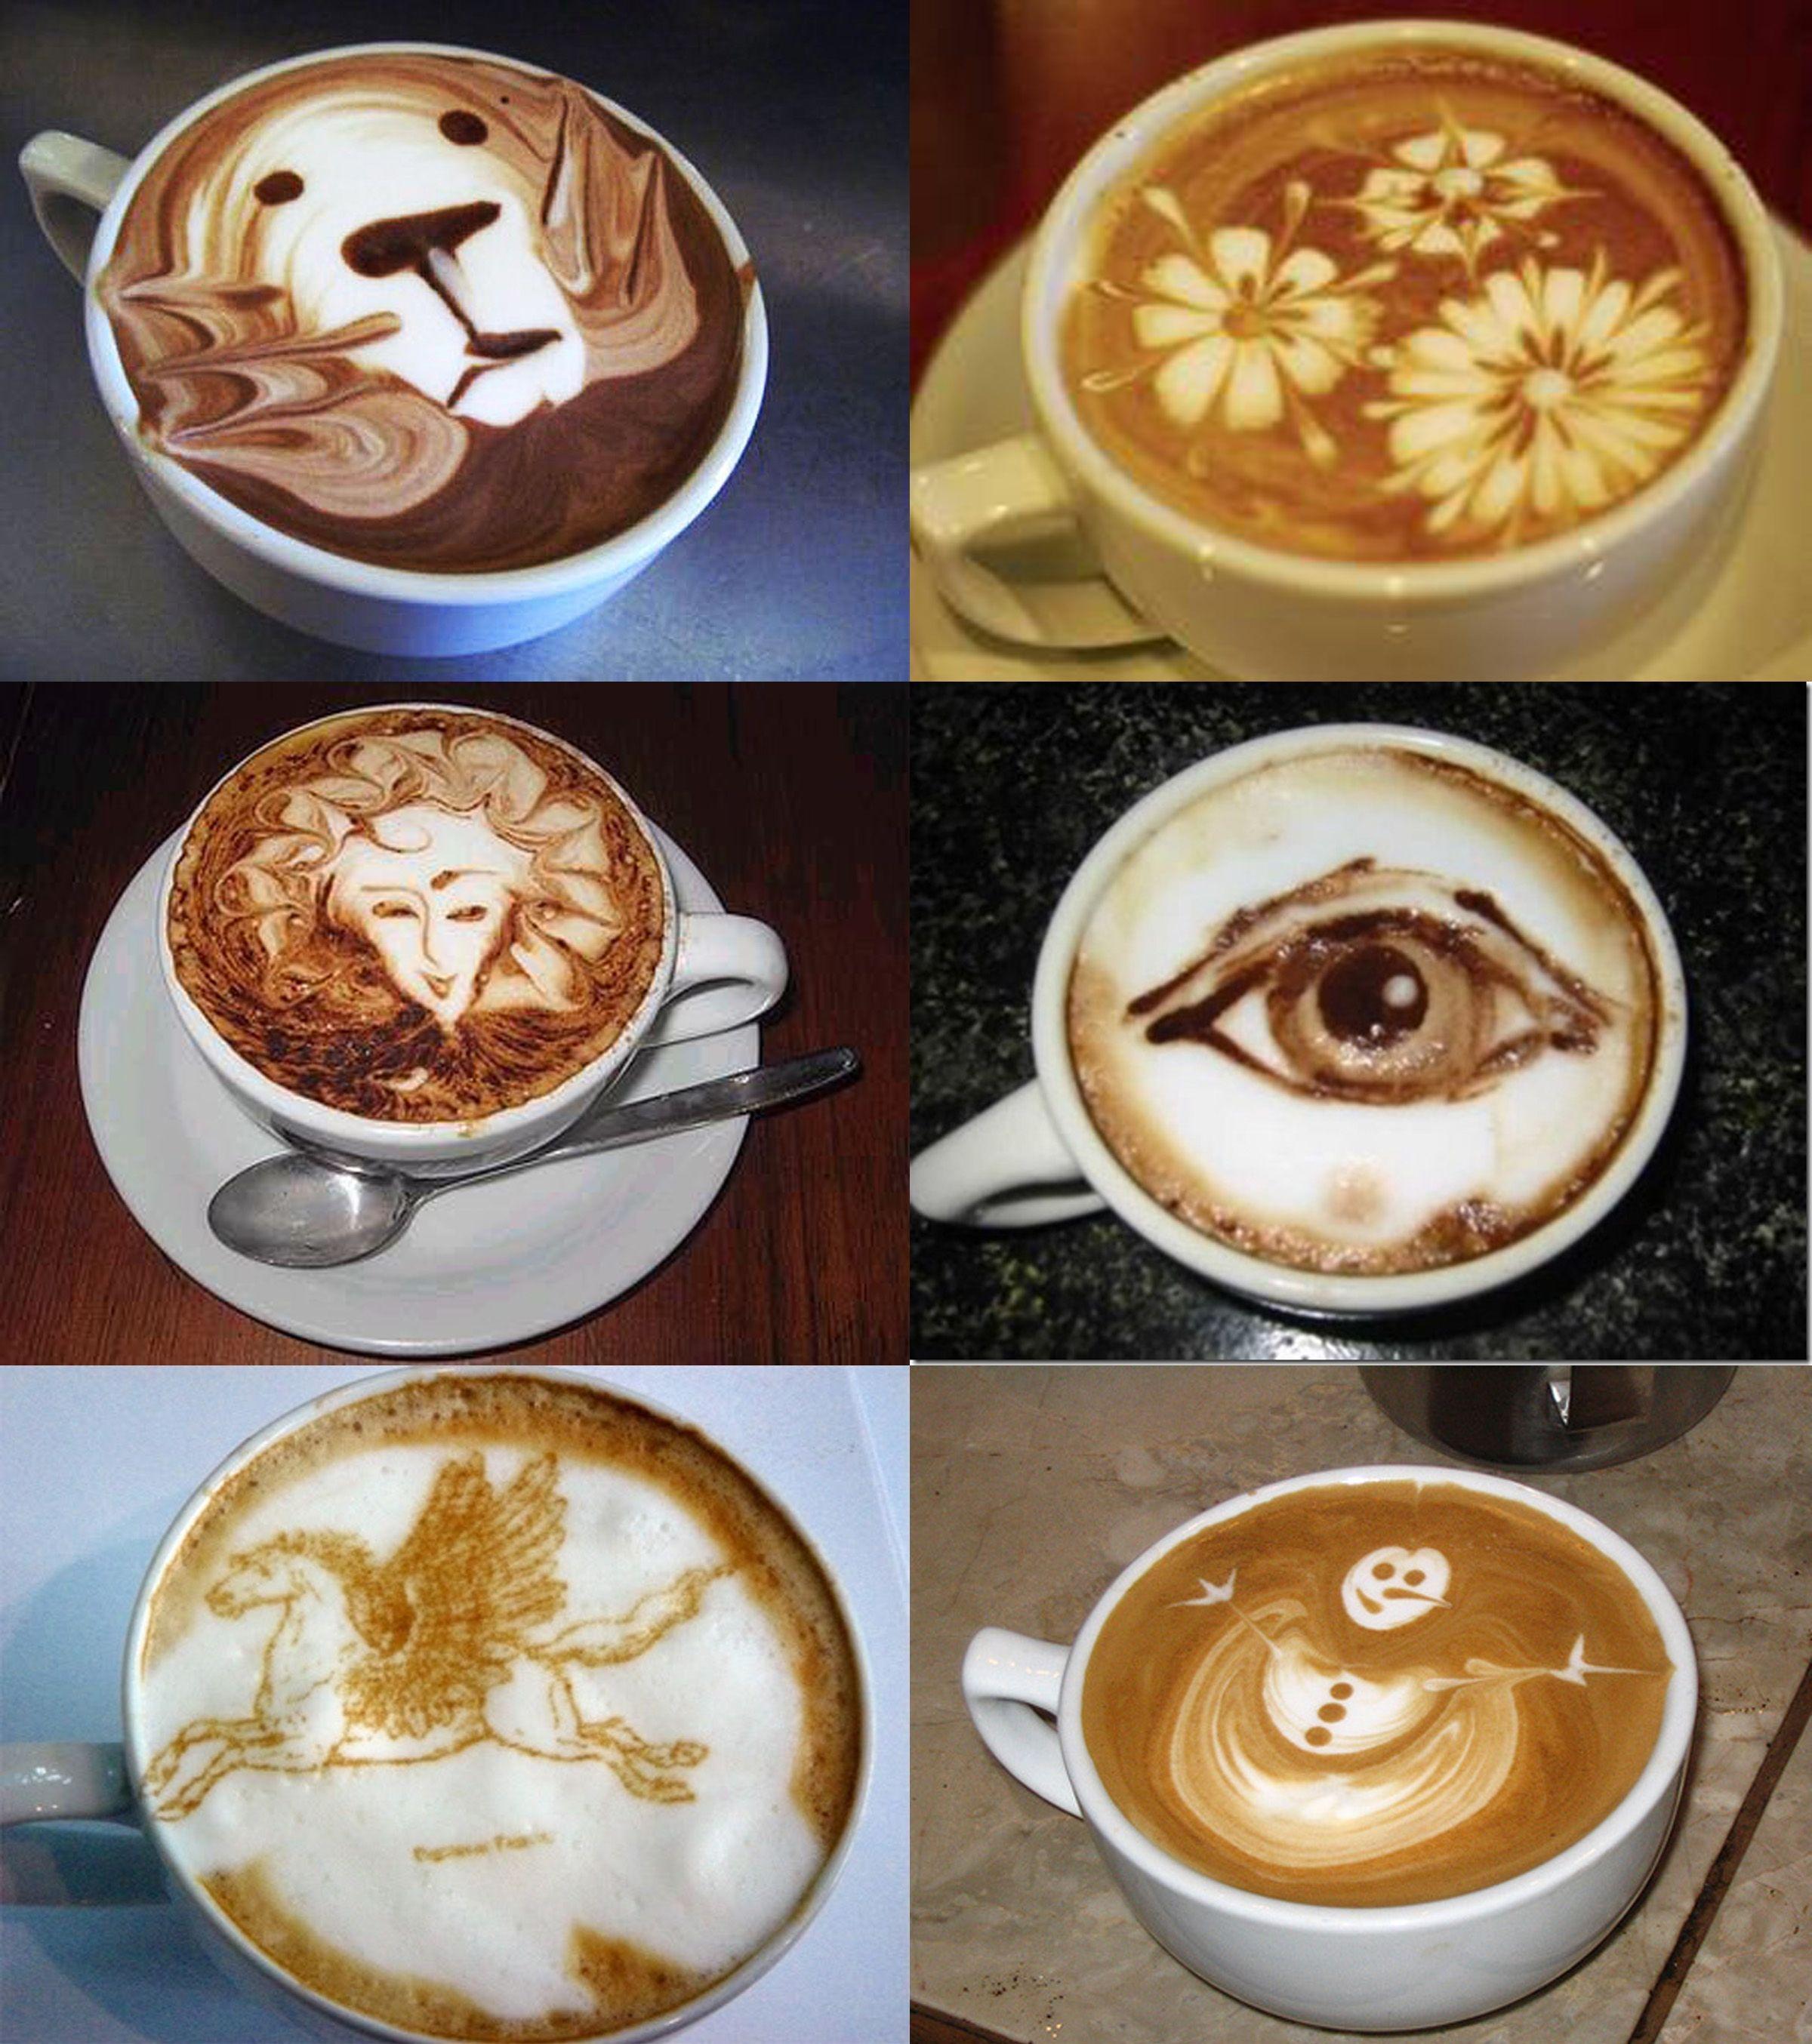 Coffee Lacking Something Advice To Make It Taste Amazing Again Coffee Recipes Coffee Art Coffee Tastes Better